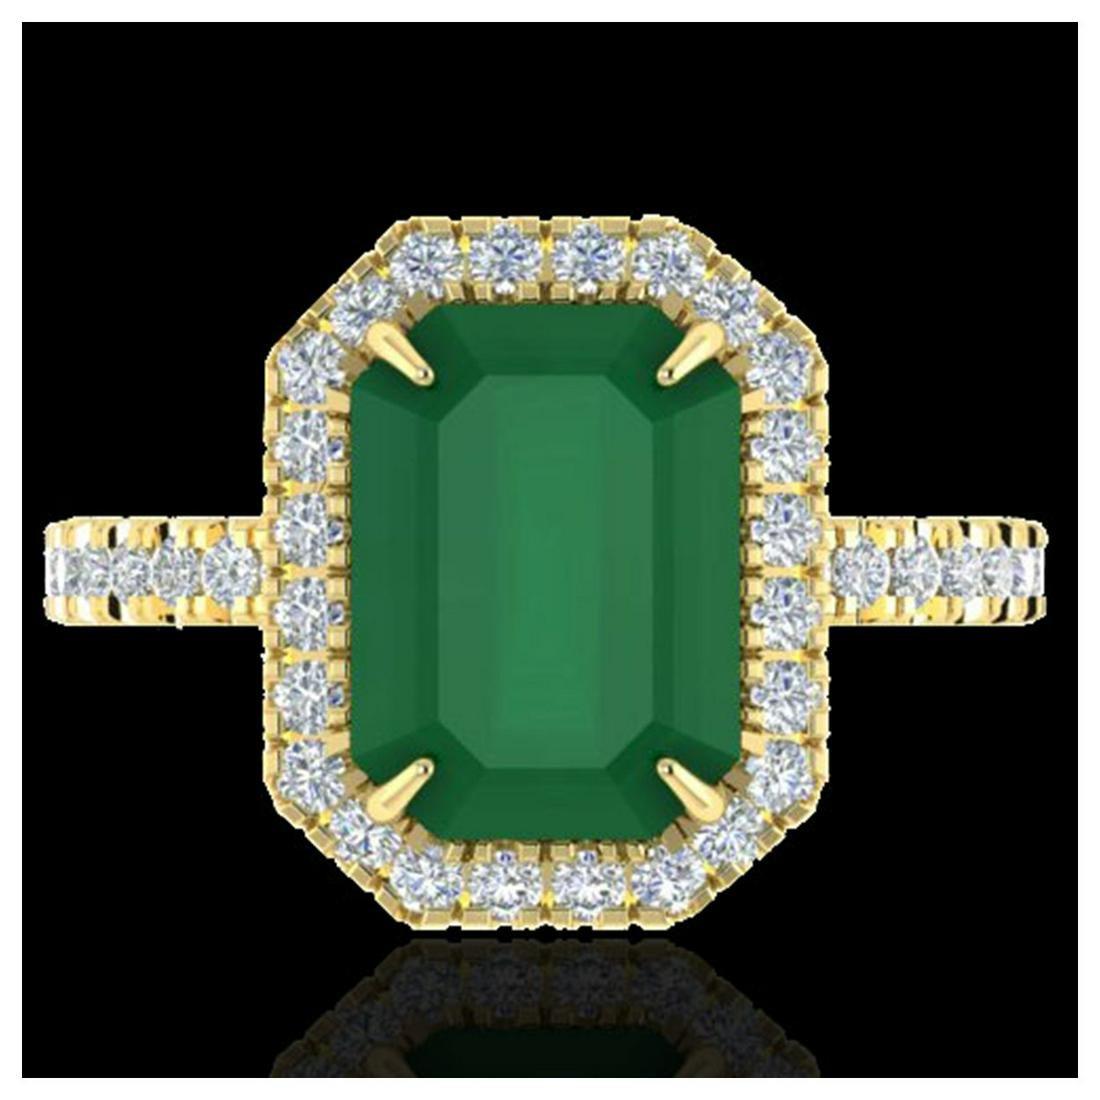 5.33 ctw Emerald And VS/SI Diamond Ring 18K Yellow Gold